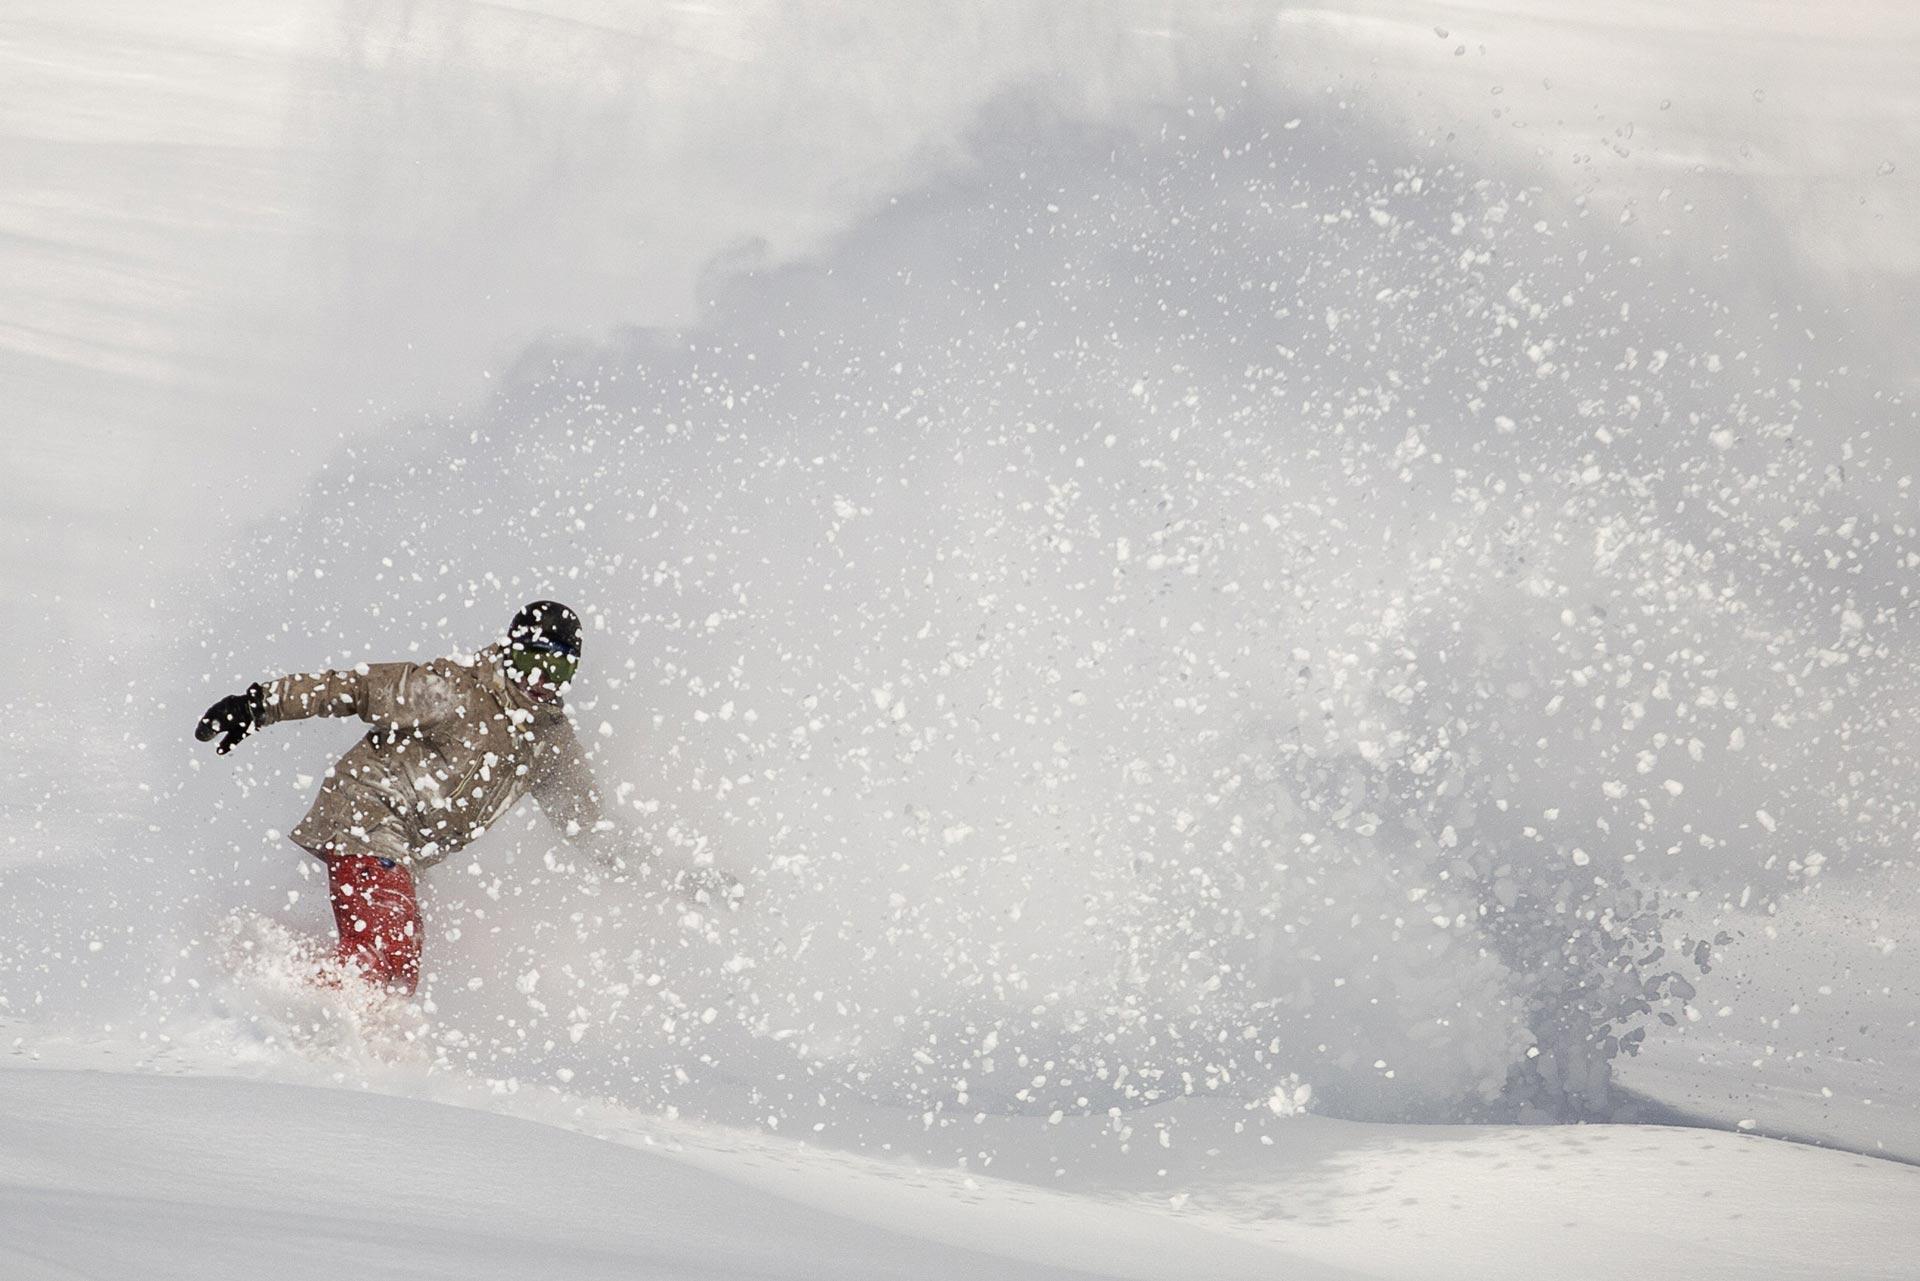 Epic powder shot of a snowboarder at Lake Louise Ski Resort. Photo: Chris Moseley